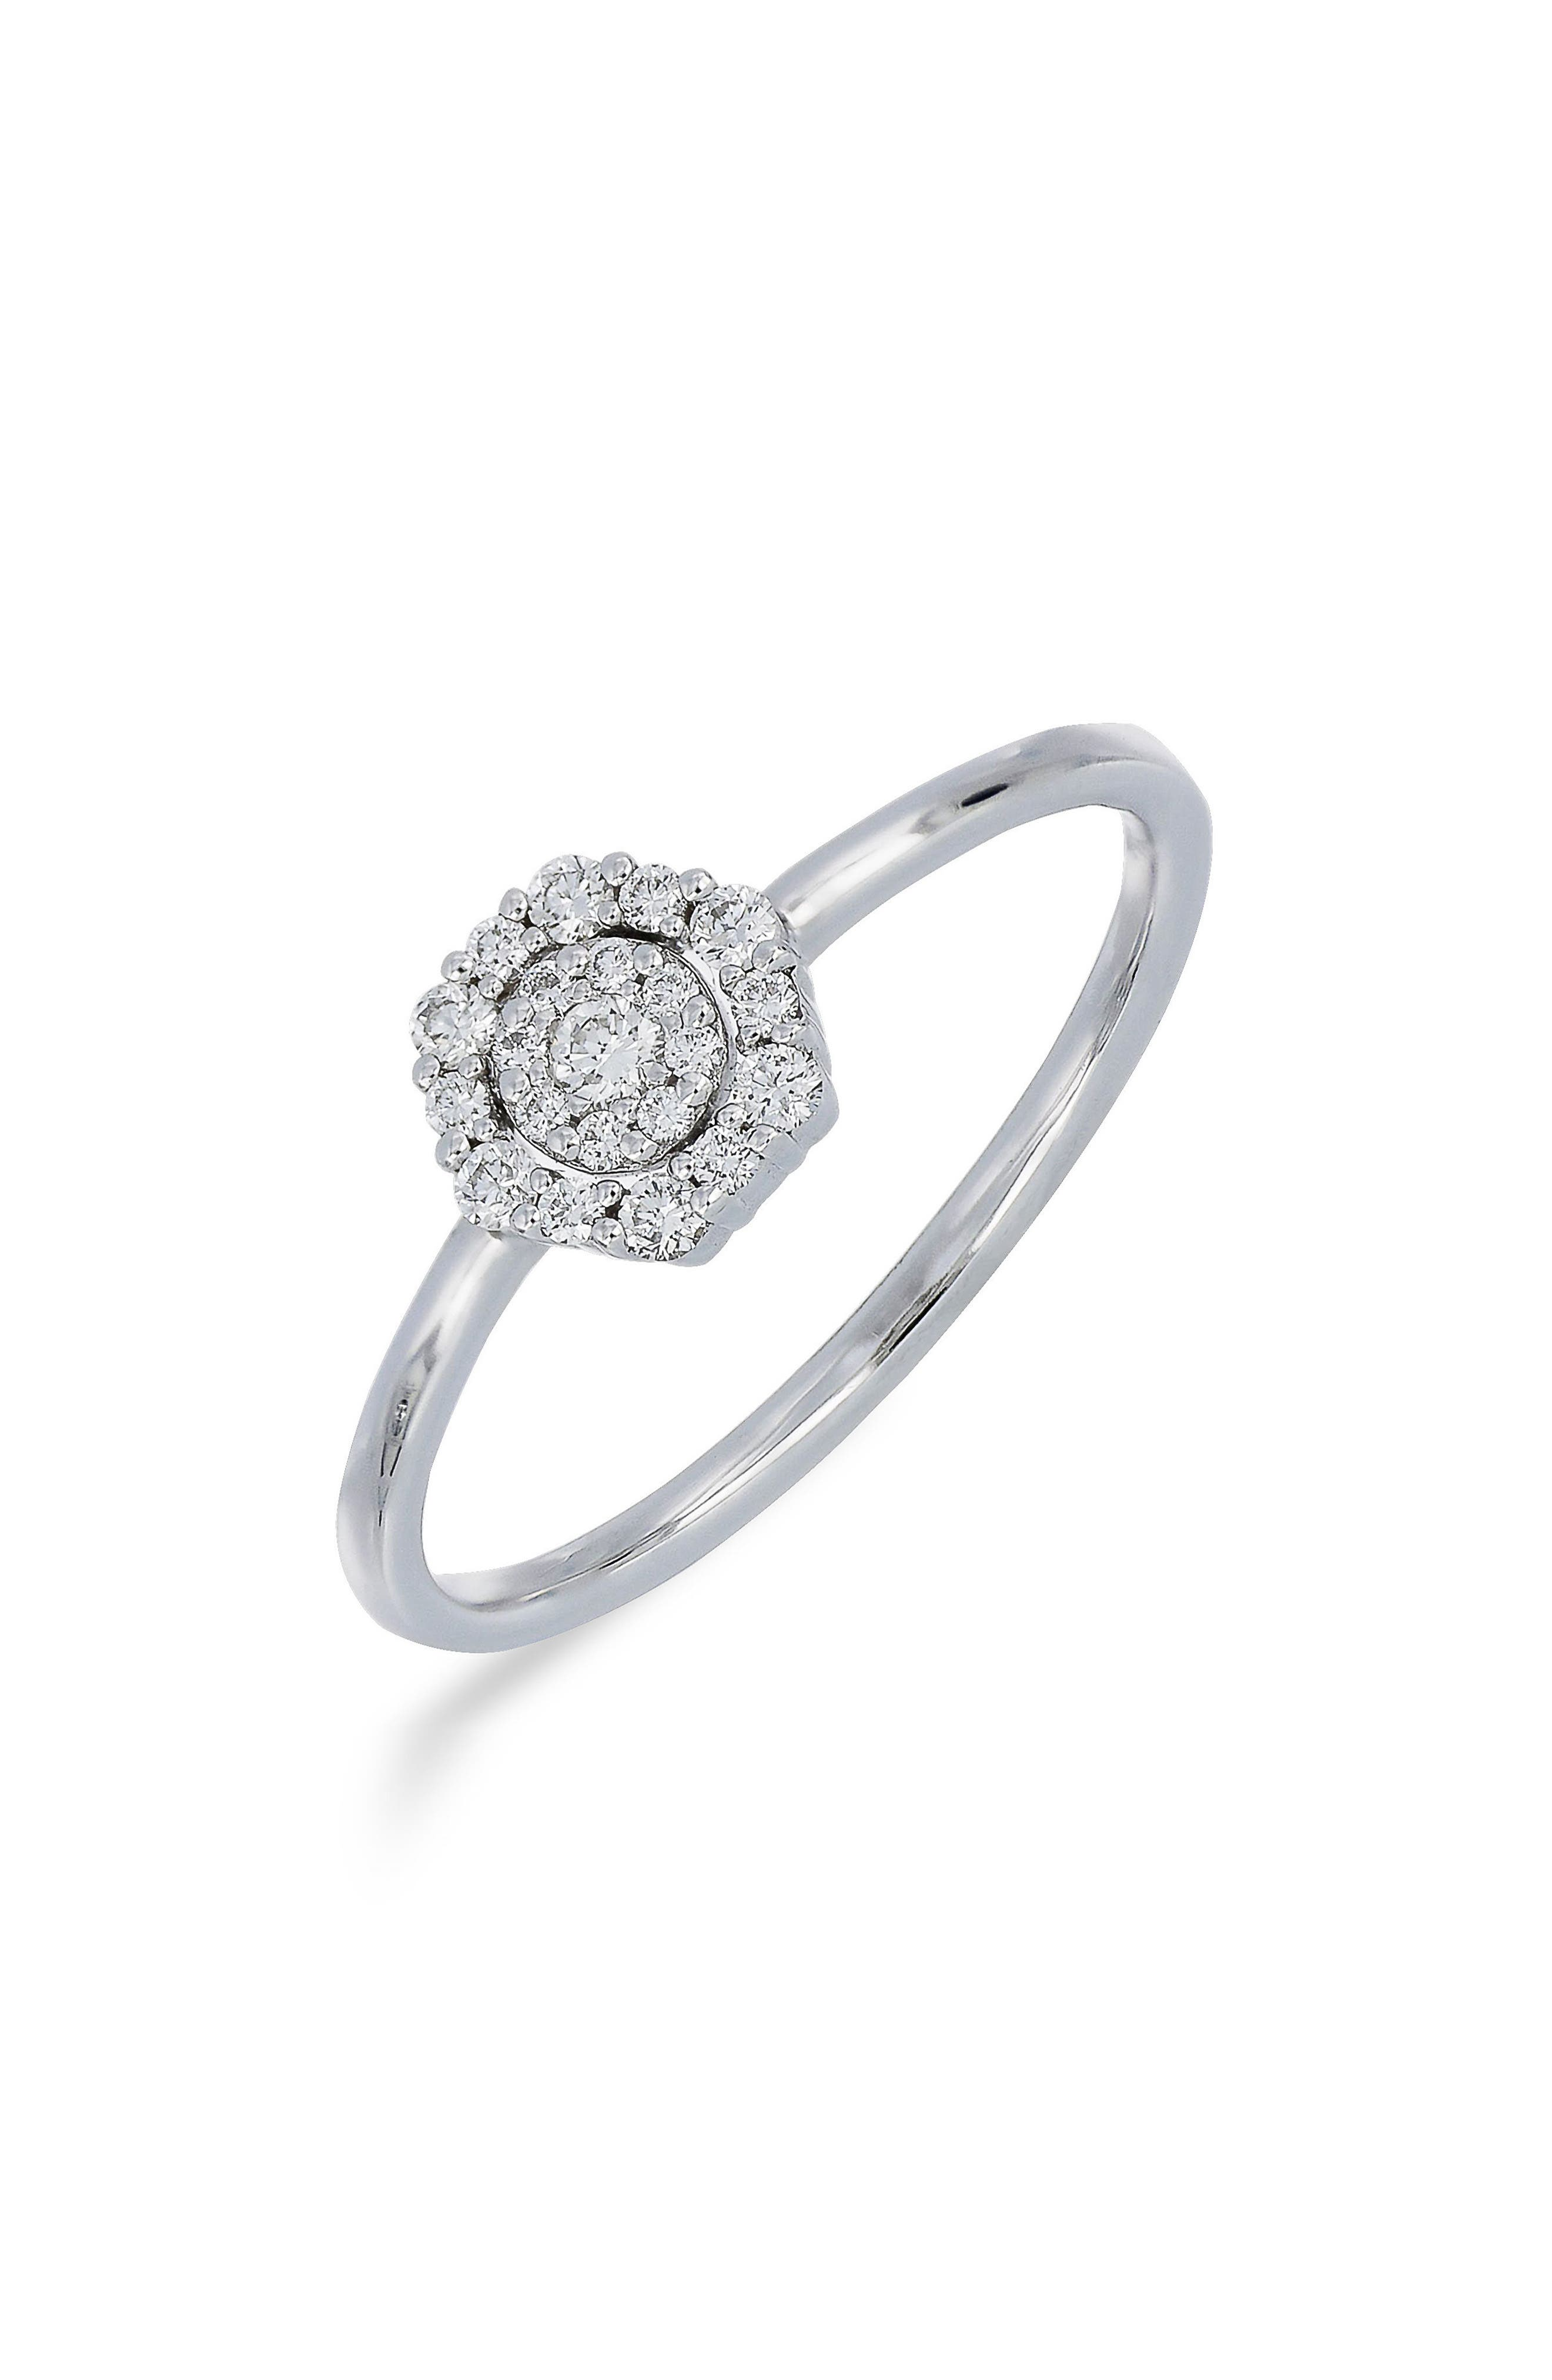 Diamond Cluster Ring,                             Main thumbnail 1, color,                             White Gold